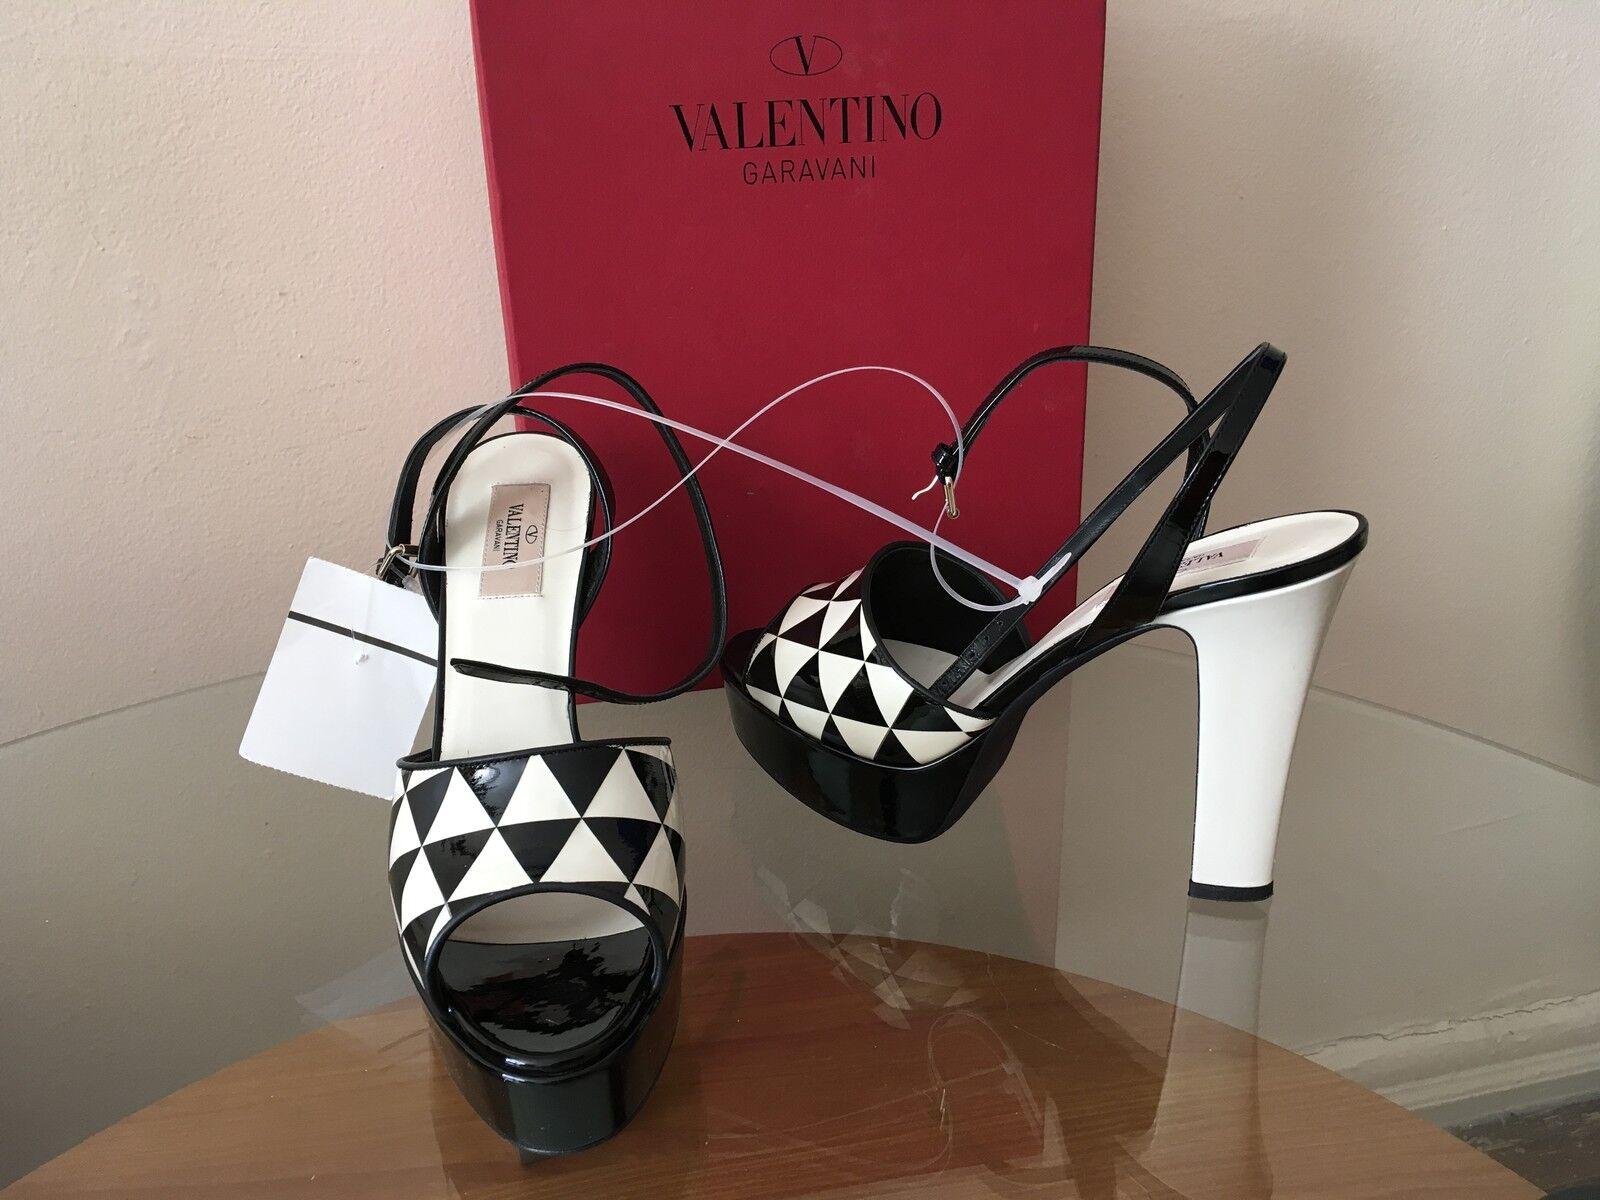 Luxury NEW Valentino Garavani Shiny Fever Patent Leather Sandals   1,095  9